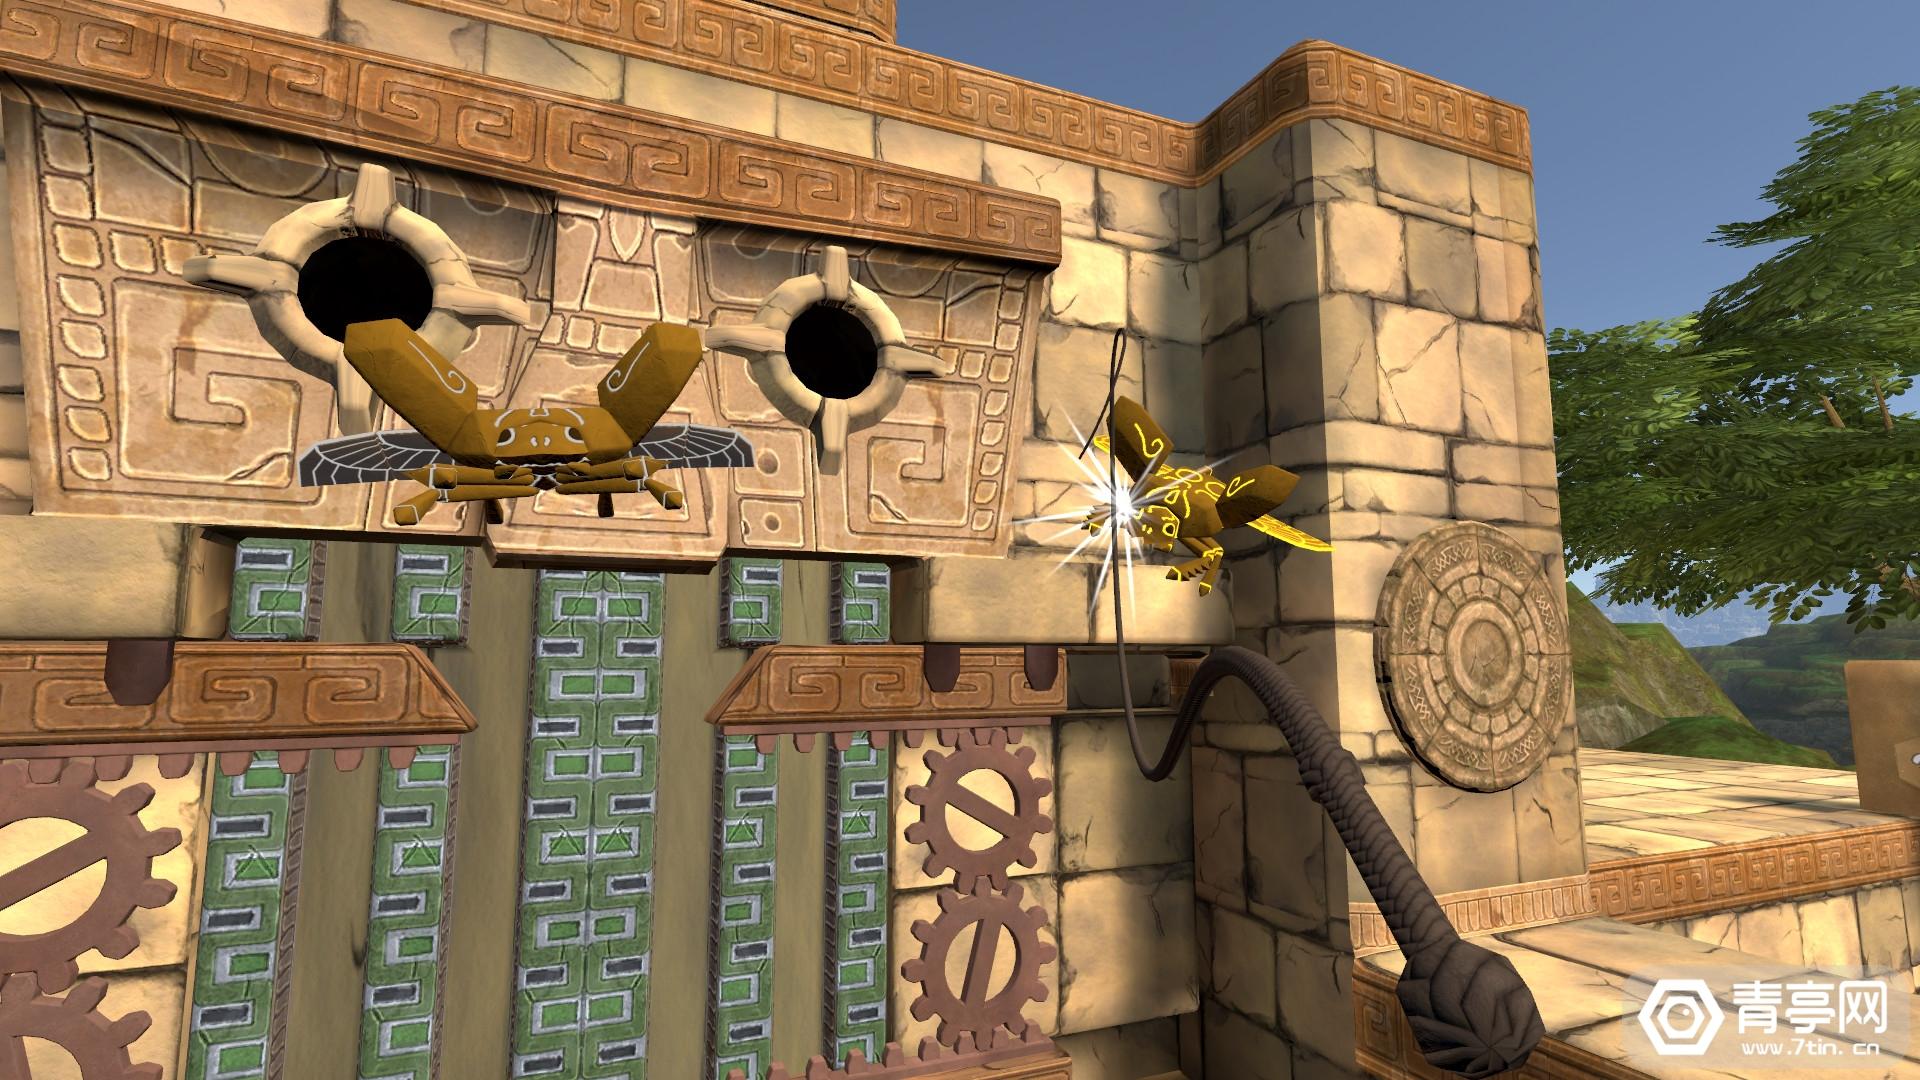 大空间冒险玩法,VR解谜游戏《Eye of the Temple》登陆Steam